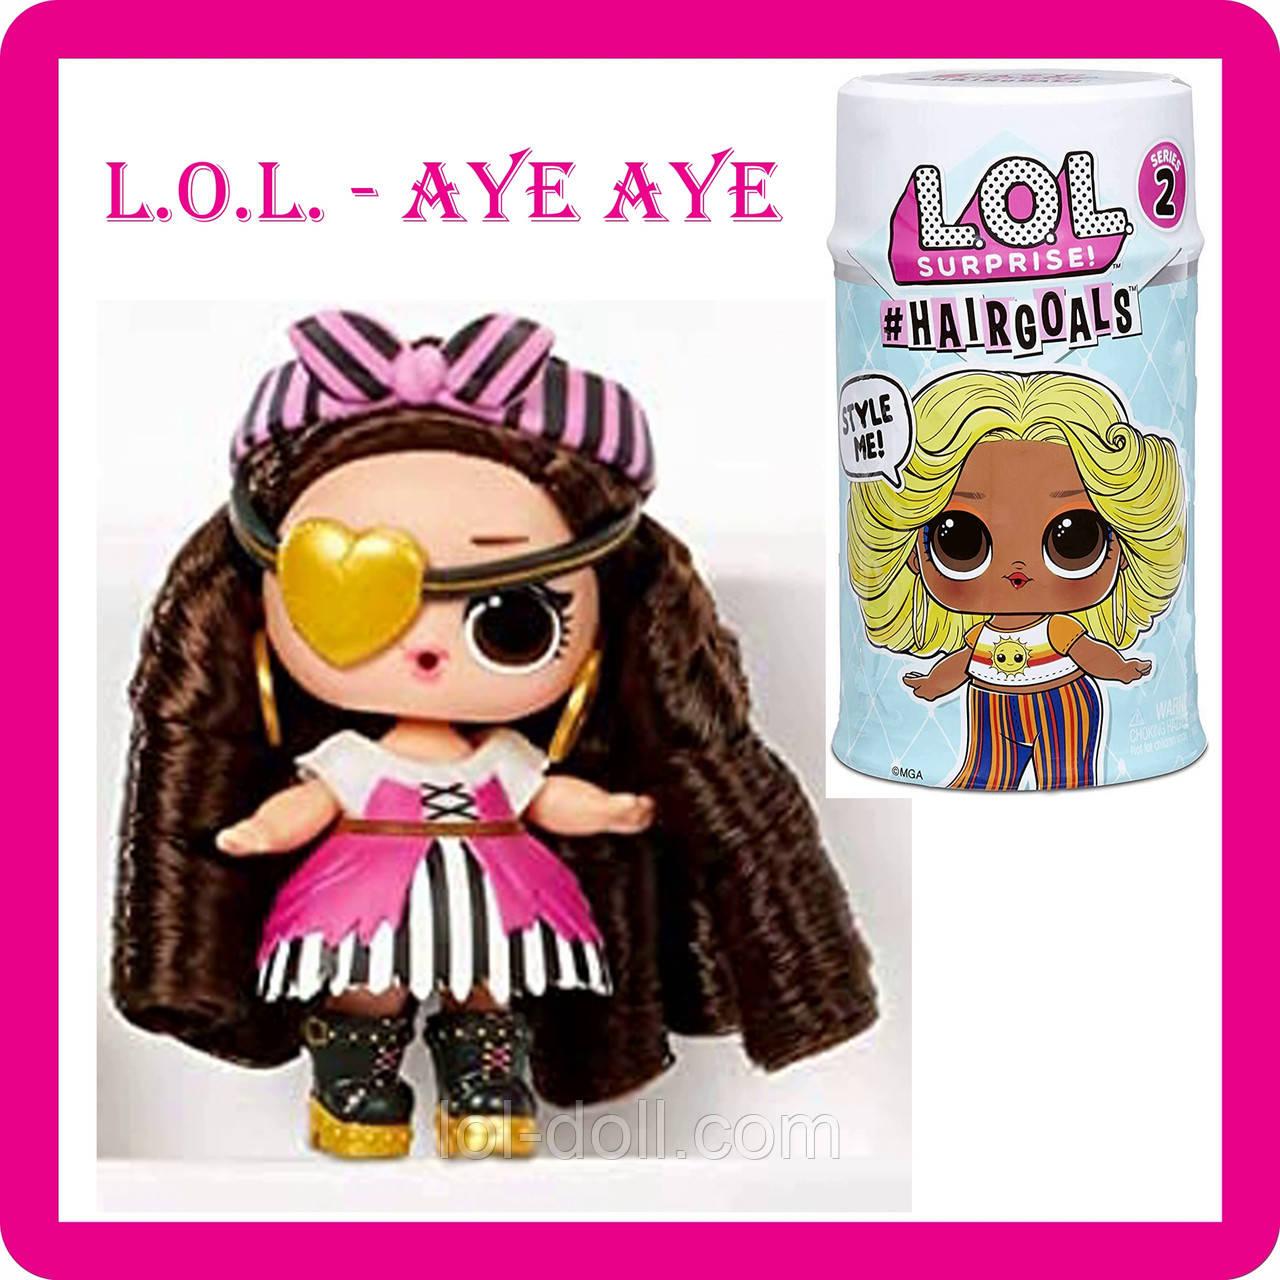 Кукла ЛОЛ Aye Aye LOL Surprise Оригинал Hairgoals 2 серия Хеиргоалс